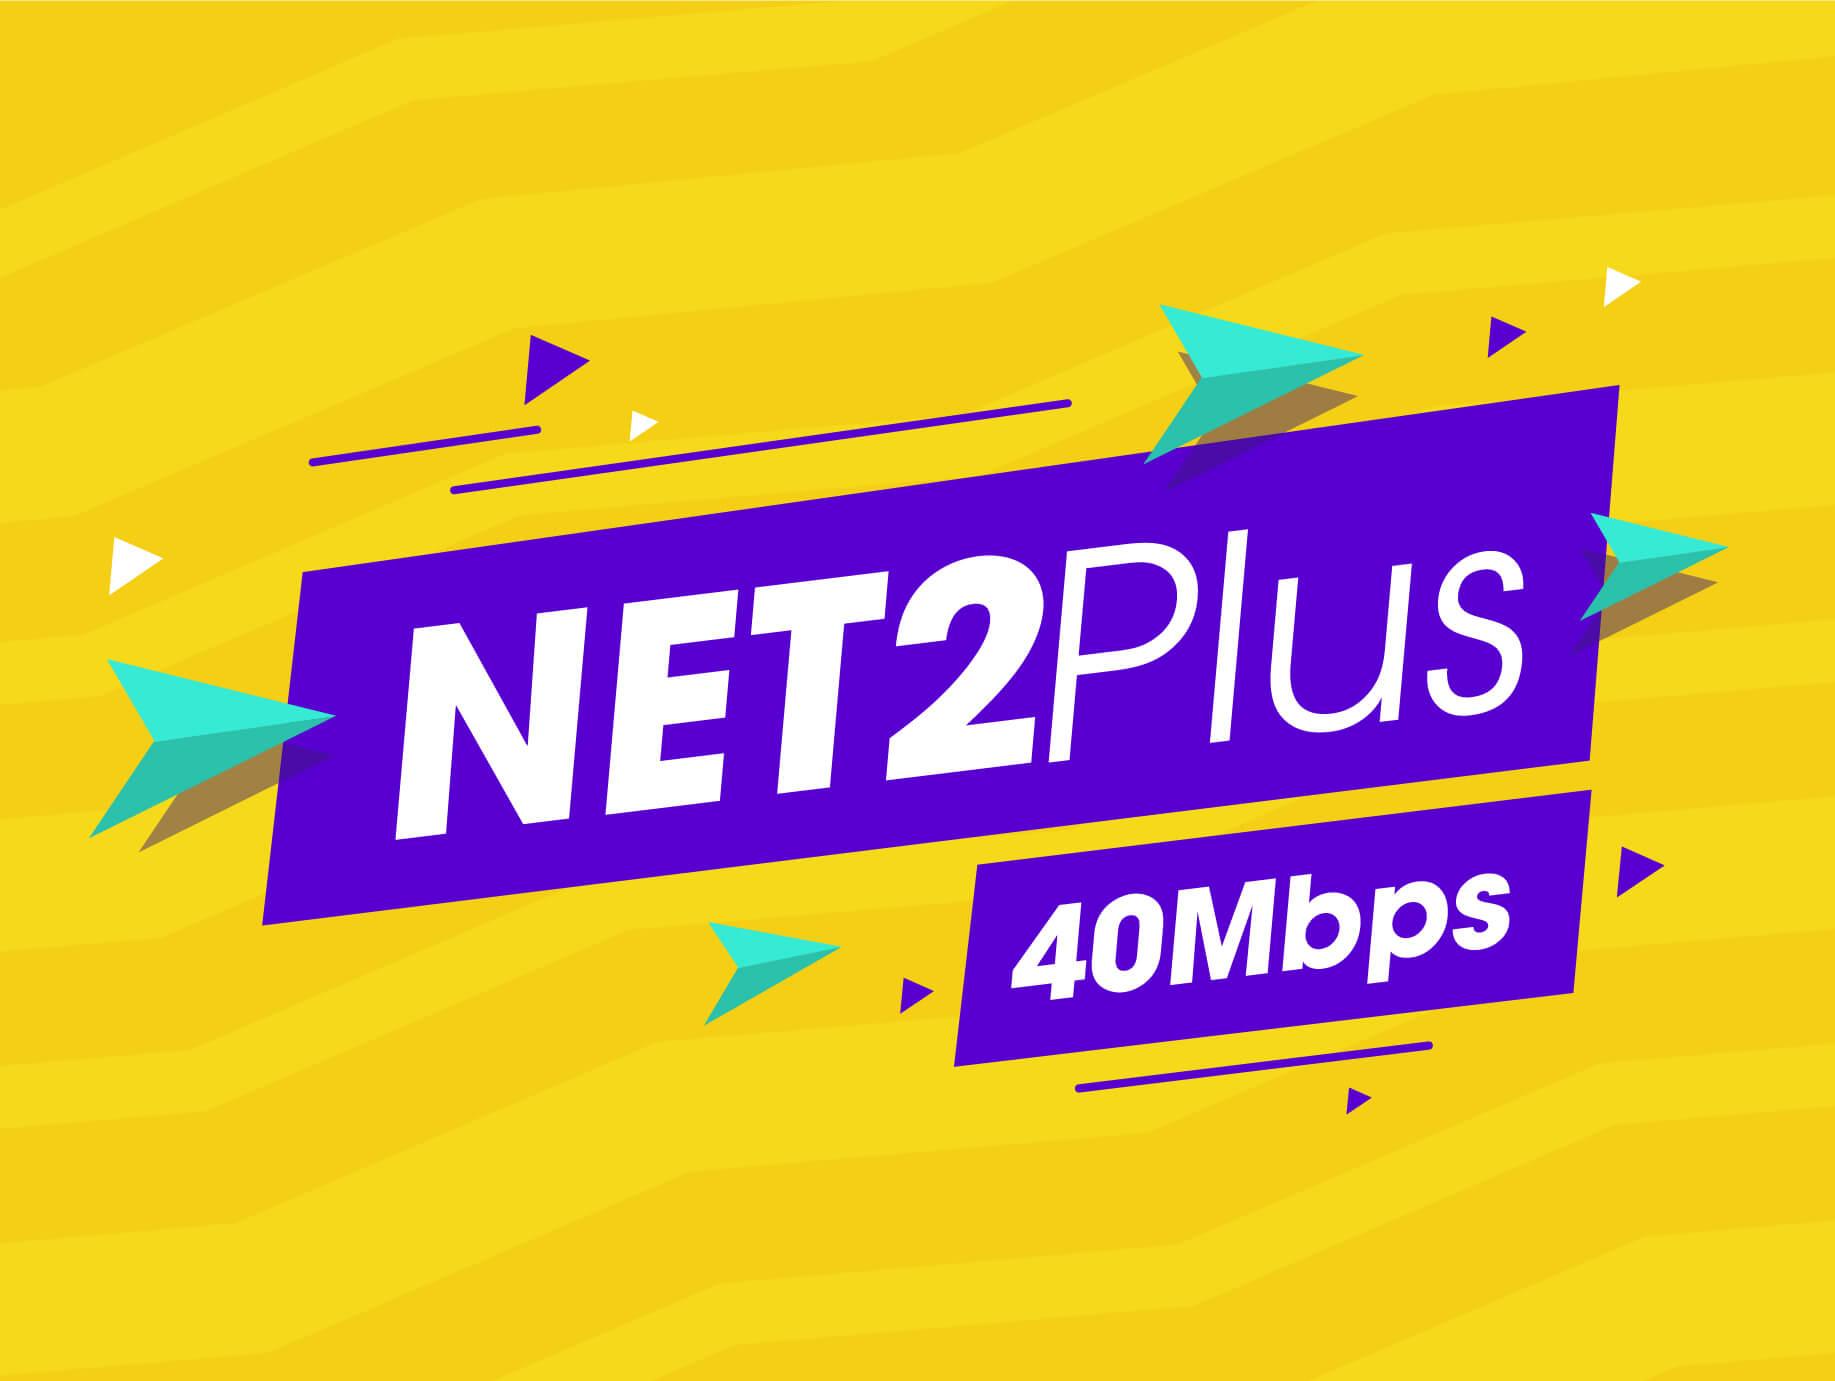 gói cước internet Viettel NET 2 PLUS